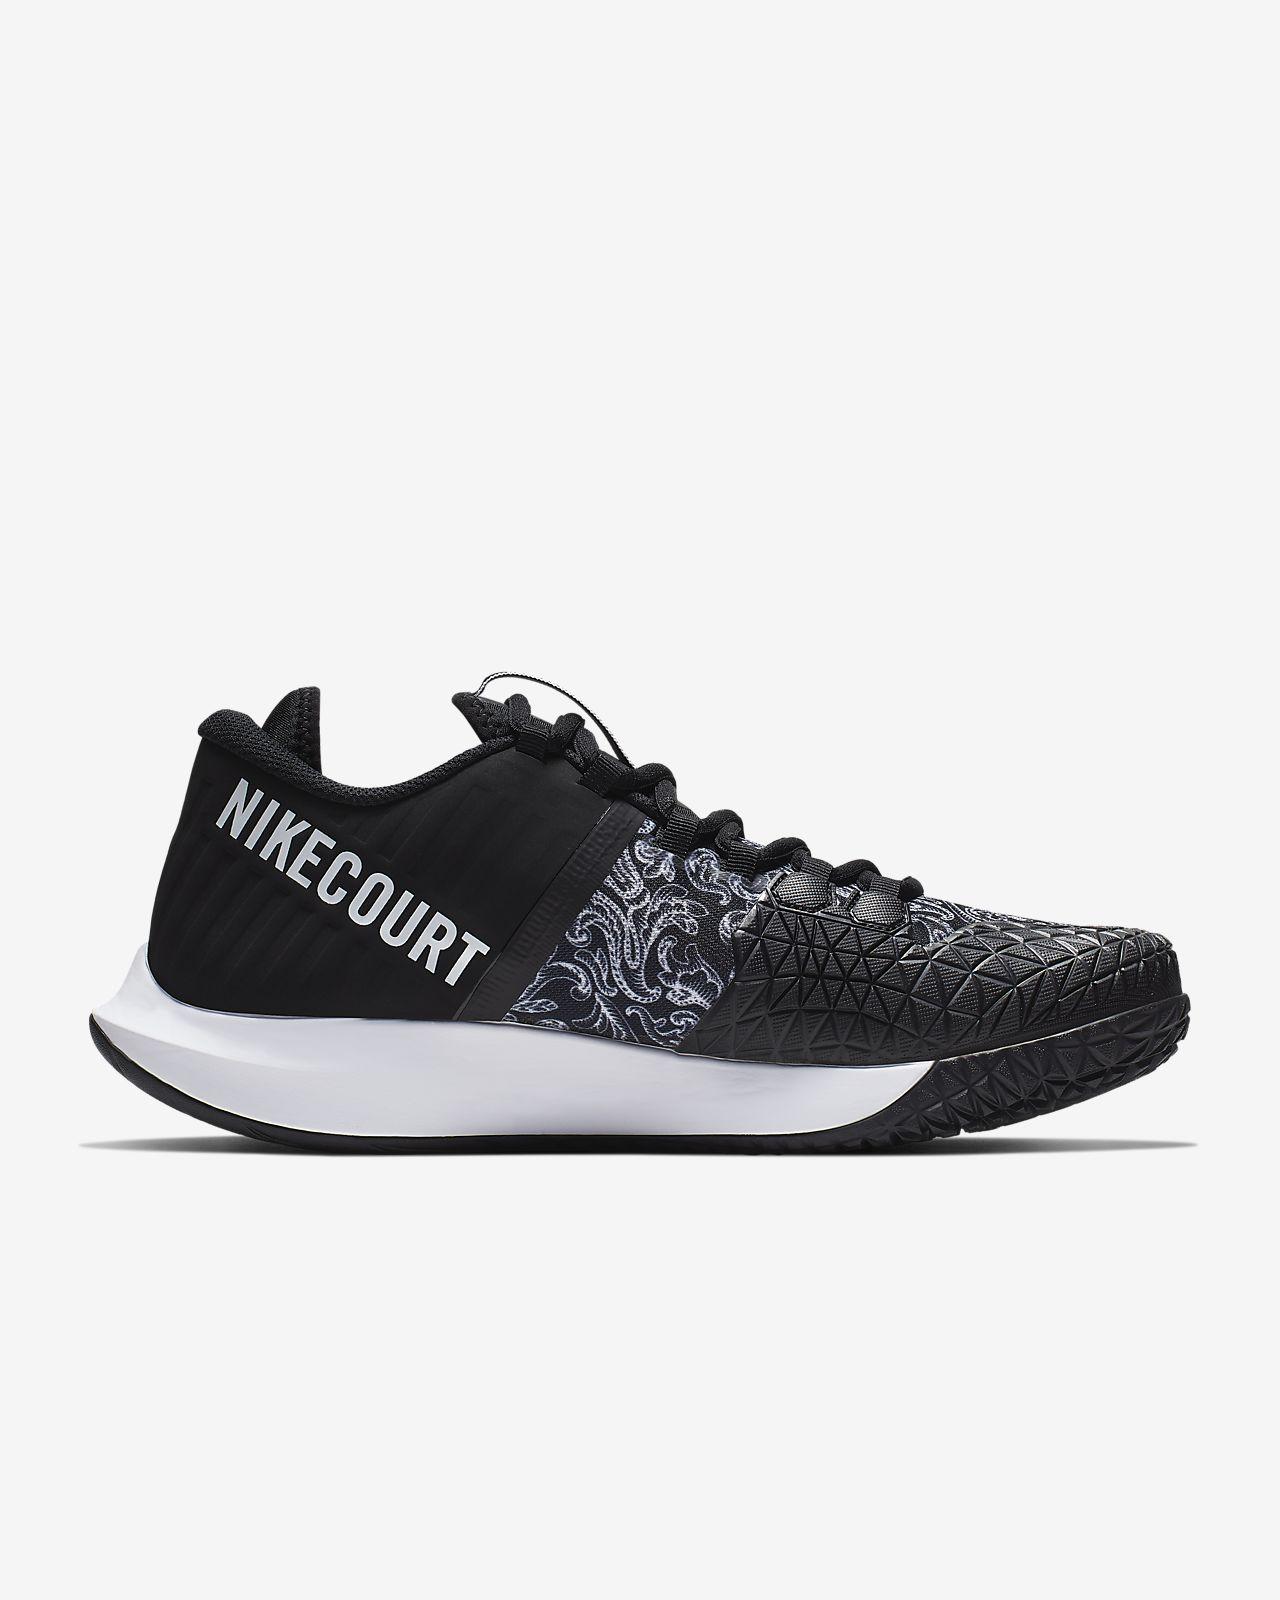 hot sale online 95b02 ffbec ... NikeCourt Air Zoom Zero Men s Tennis Shoe